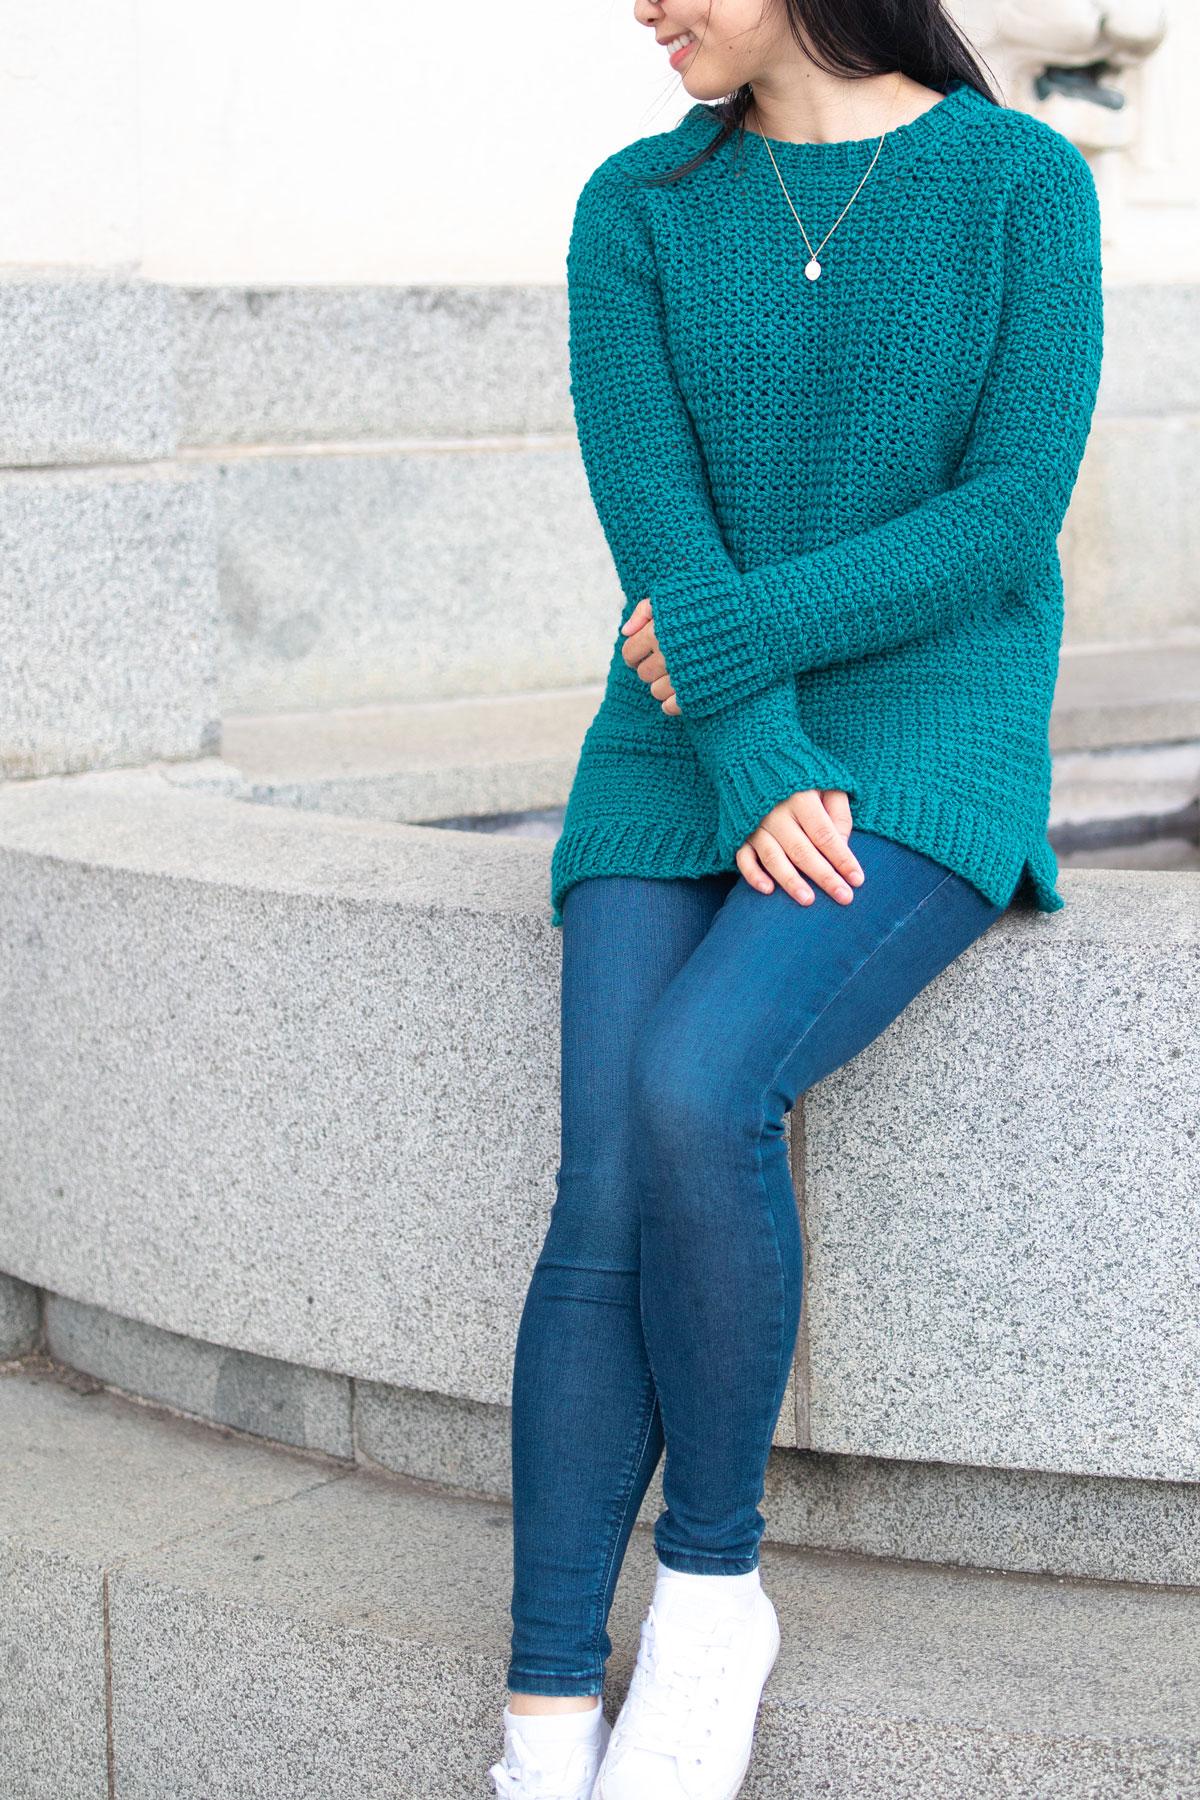 long crochet sweater green pullover blue jeans sitting on ledge